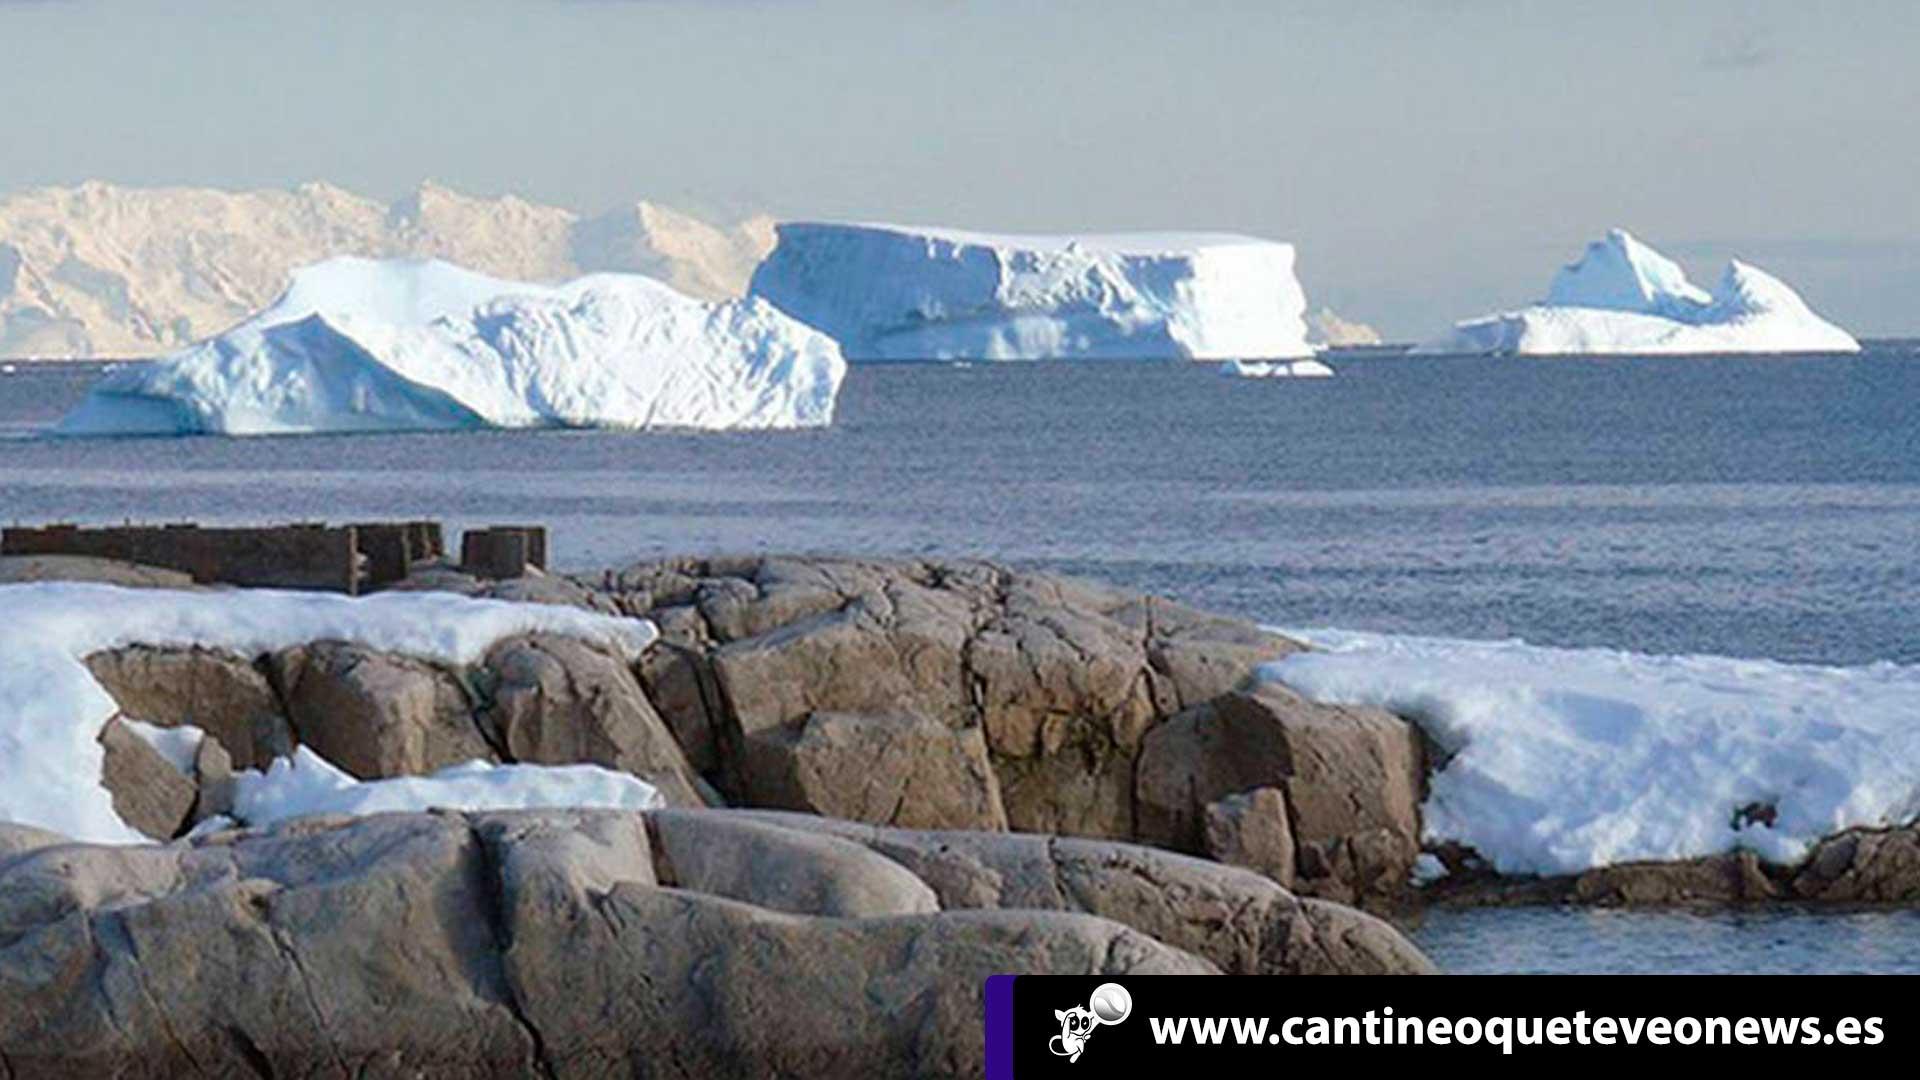 Cantineoqueteveo News - Antártida pierde capas